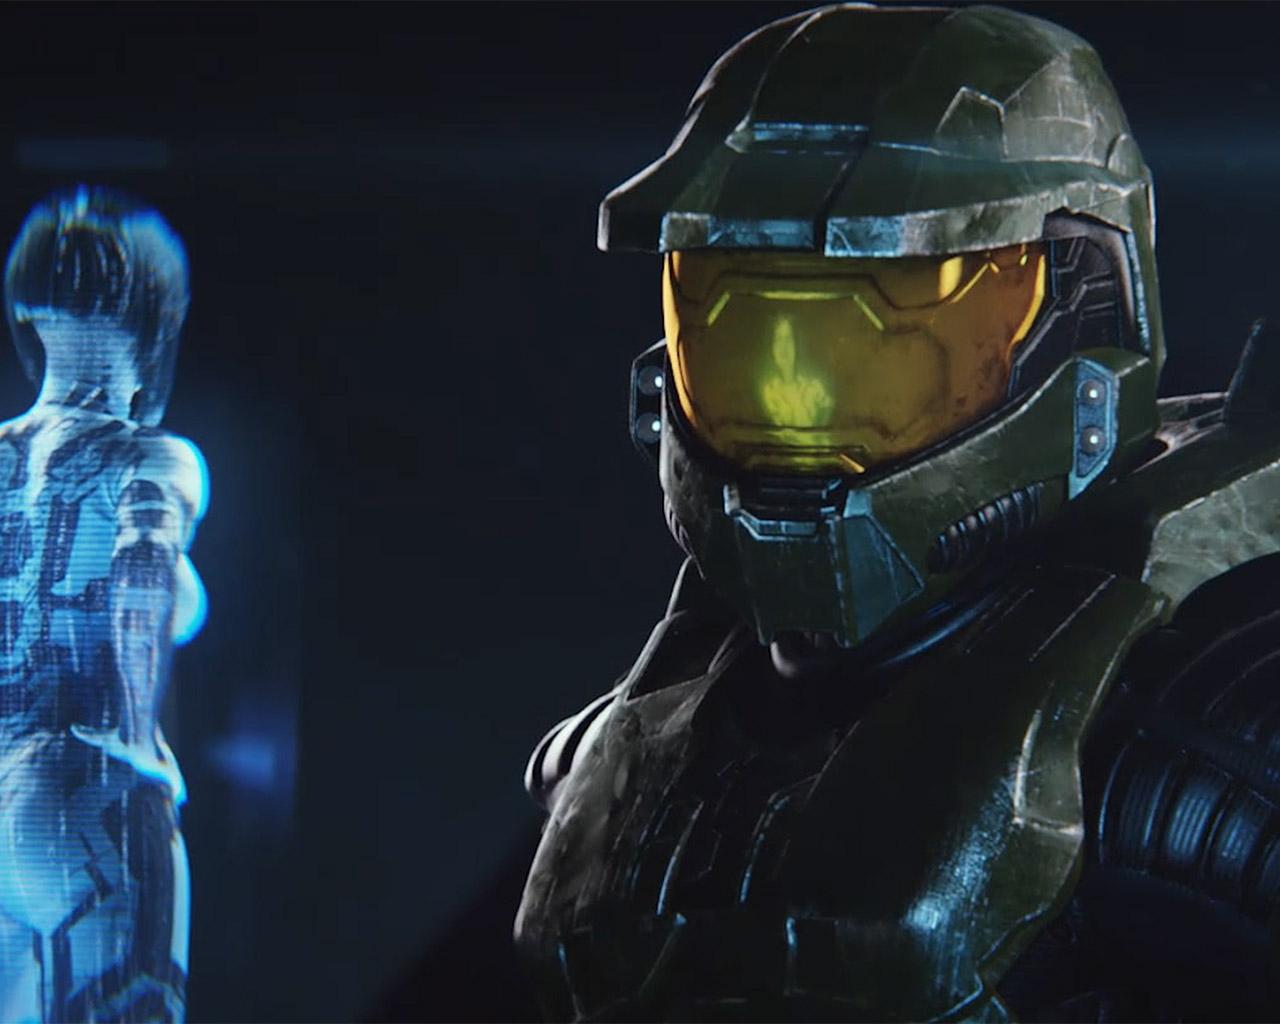 Halo 2 Wallpaper in 1280x1024